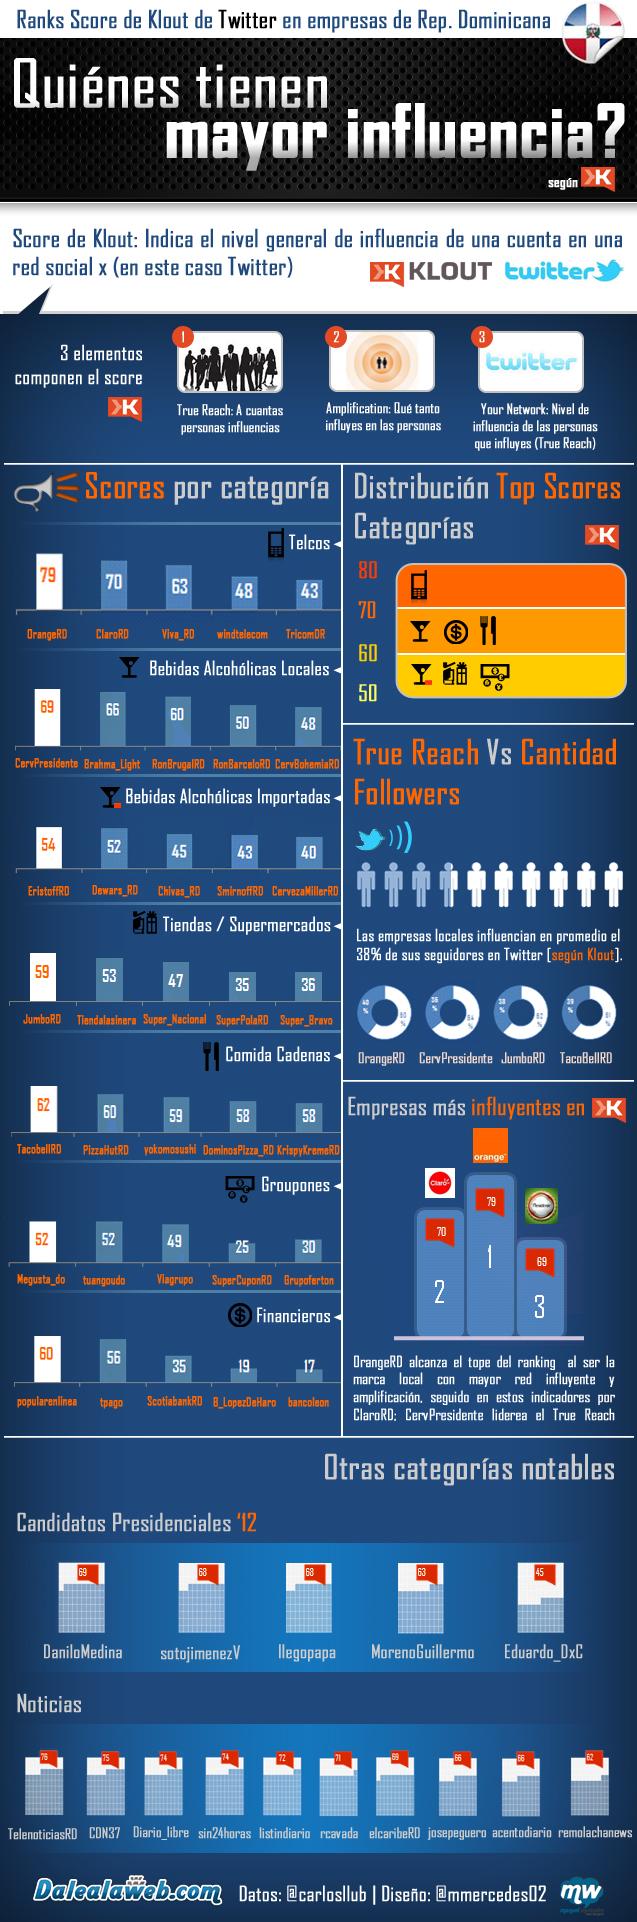 Infografia-de-score-de-Klout-en-Twitter-marcas-o-empresas-en-la-Republica-Dominicana.jpg